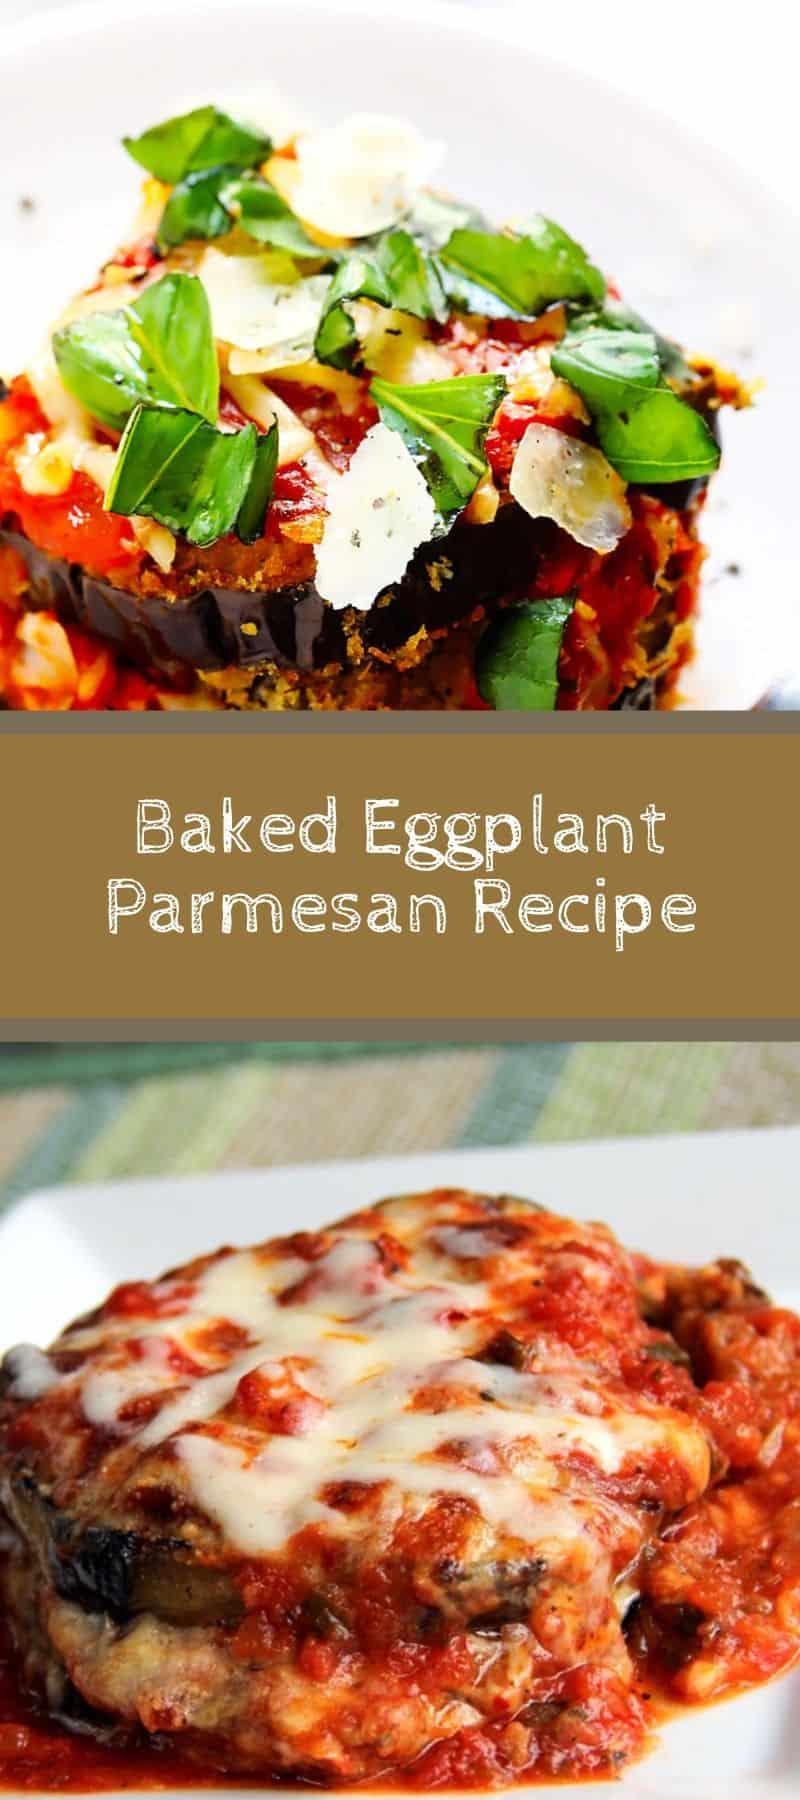 Baked Eggplant Parmesan Recipe 3